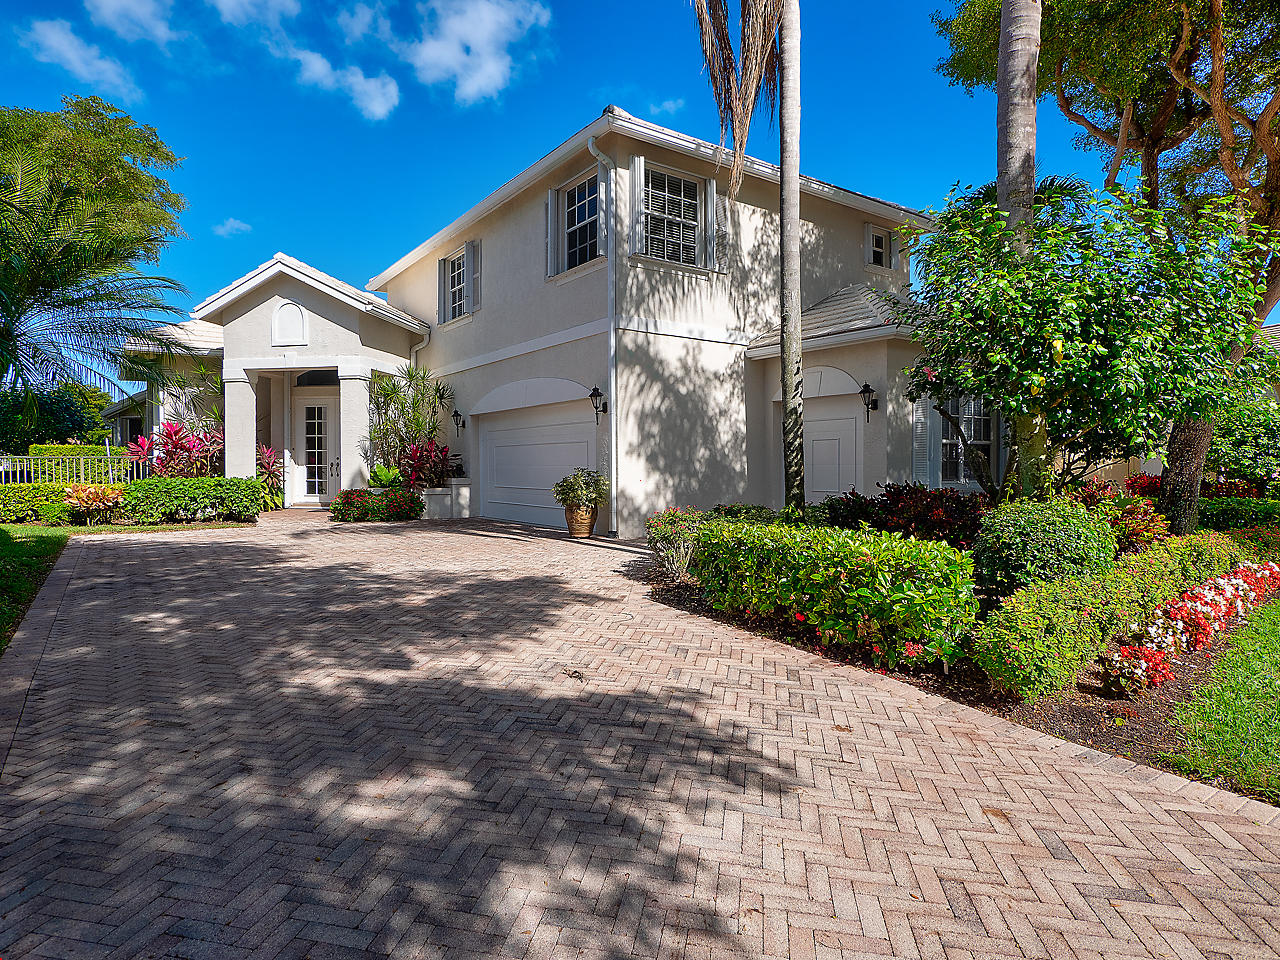 114 Victoria Bay Court, Palm Beach Gardens, Florida 33418, 4 Bedrooms Bedrooms, ,4 BathroomsBathrooms,A,Single family,Victoria Bay,RX-10591392